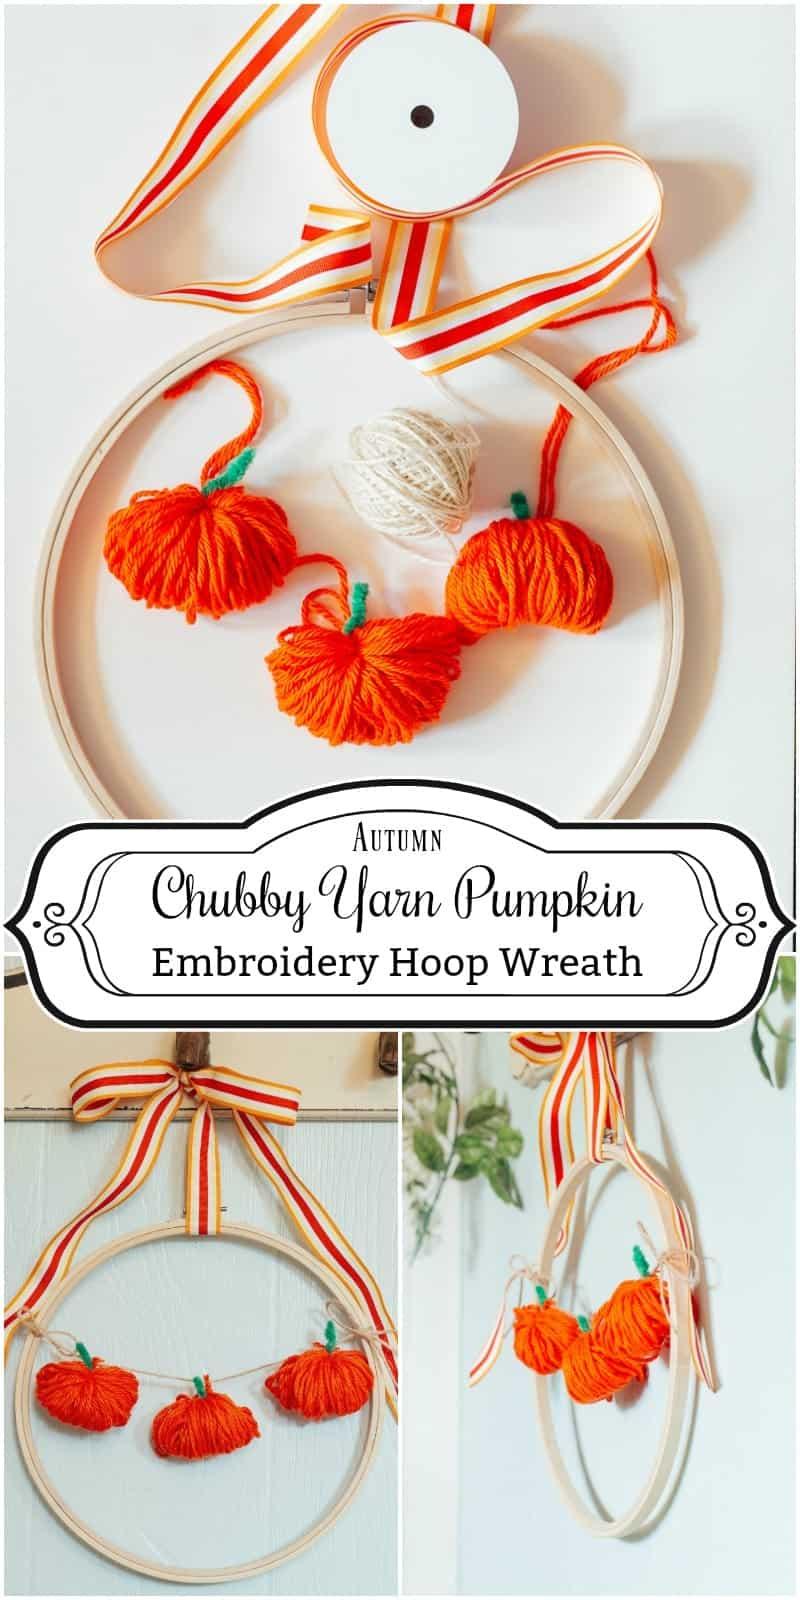 How to Make an Embroidery Hoop Chubby Pumpkin Wreath